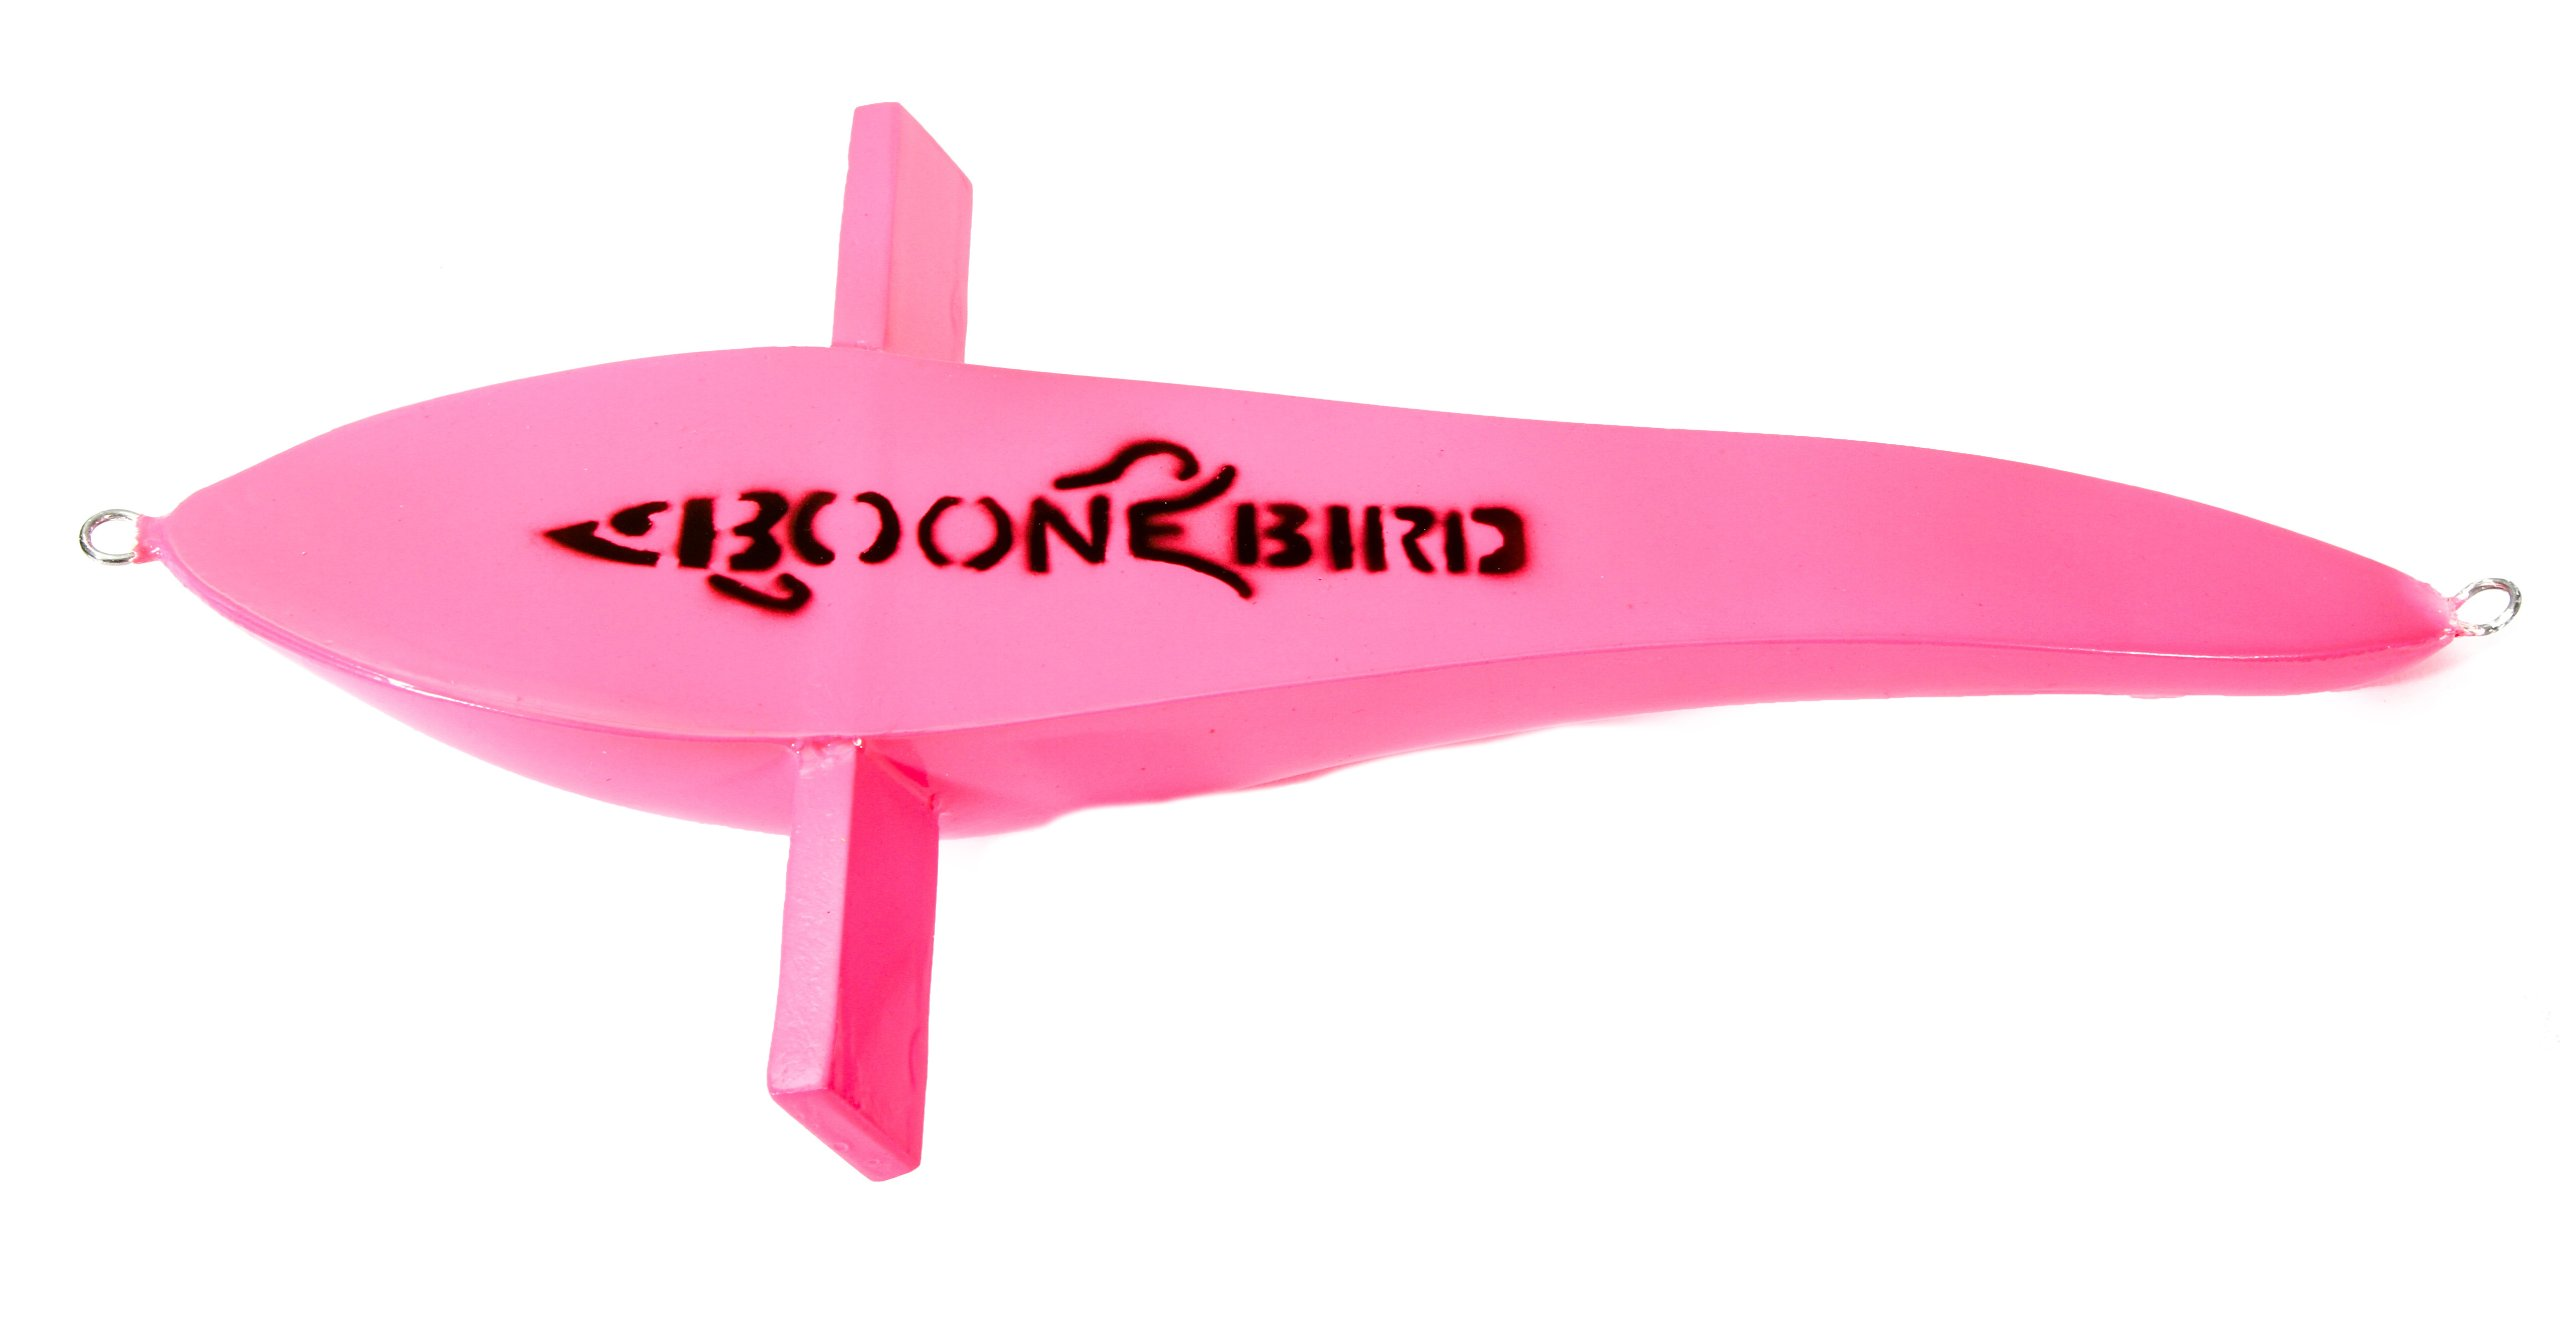 Boone Unrigged Bird Teaser, Pink, 12-Inch by Boone